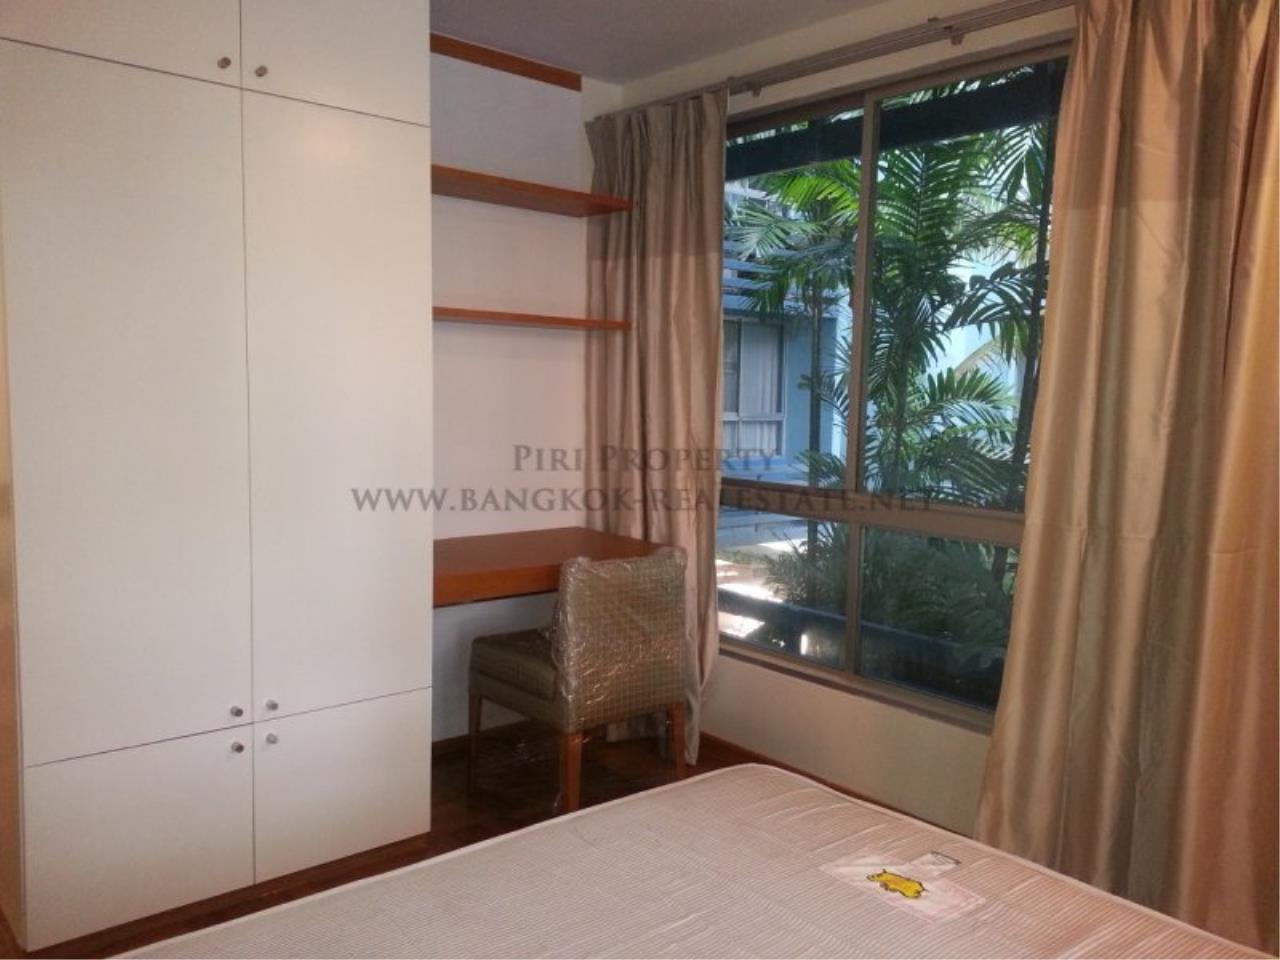 Piri Property Agency's Bangkok Garden - Spacious 2 Bedroom for 28K - Low Floor 5